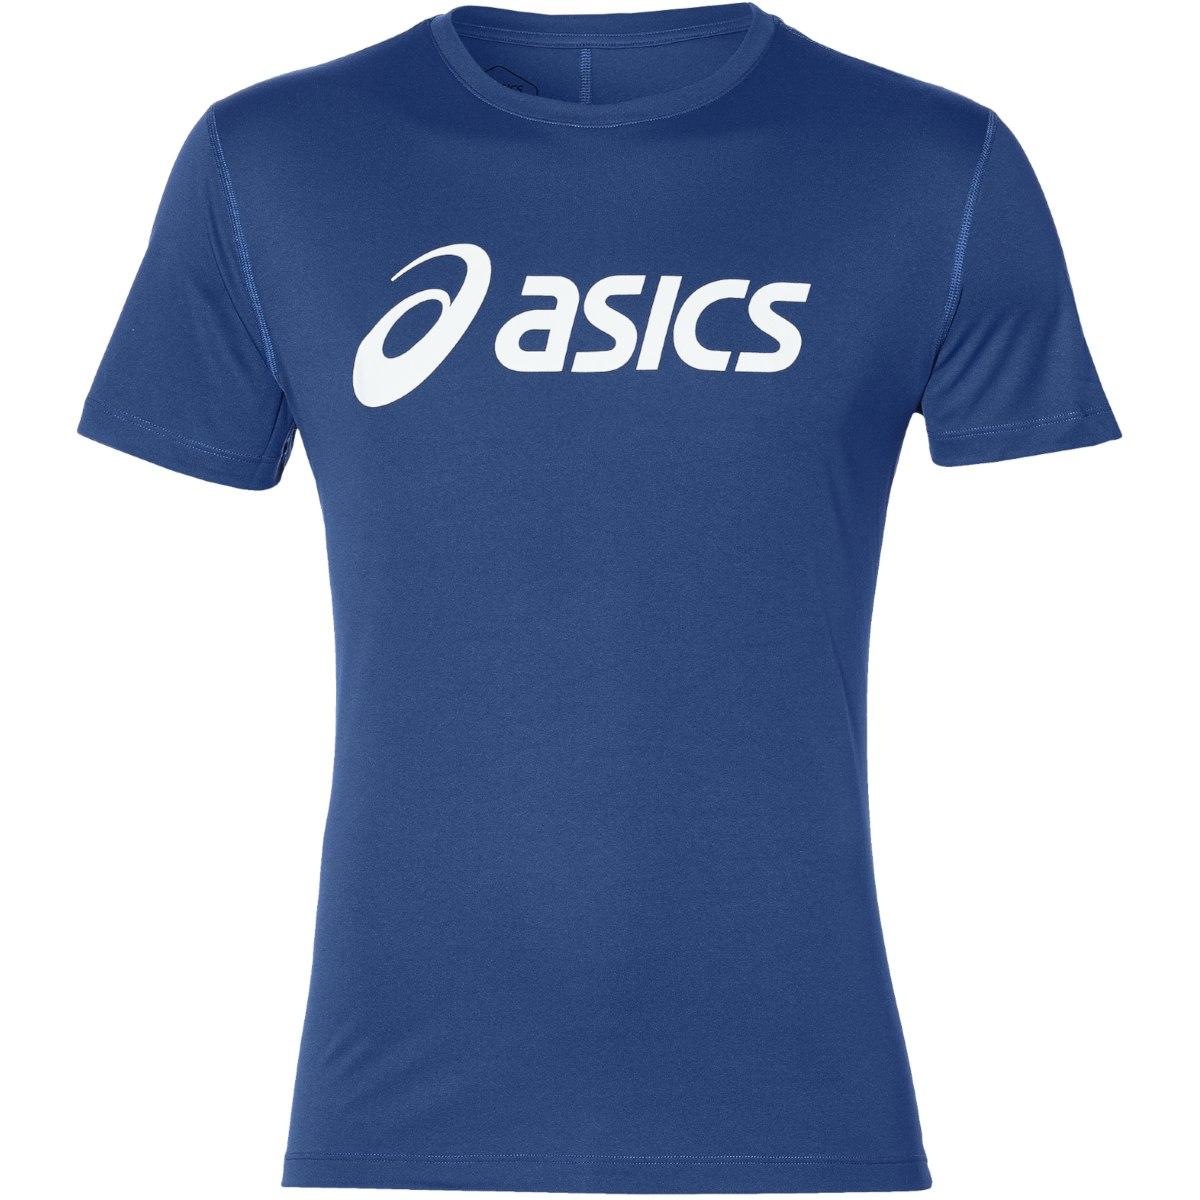 asics Silver Graphic Short Sleeve Top - asics blue/brilliant white